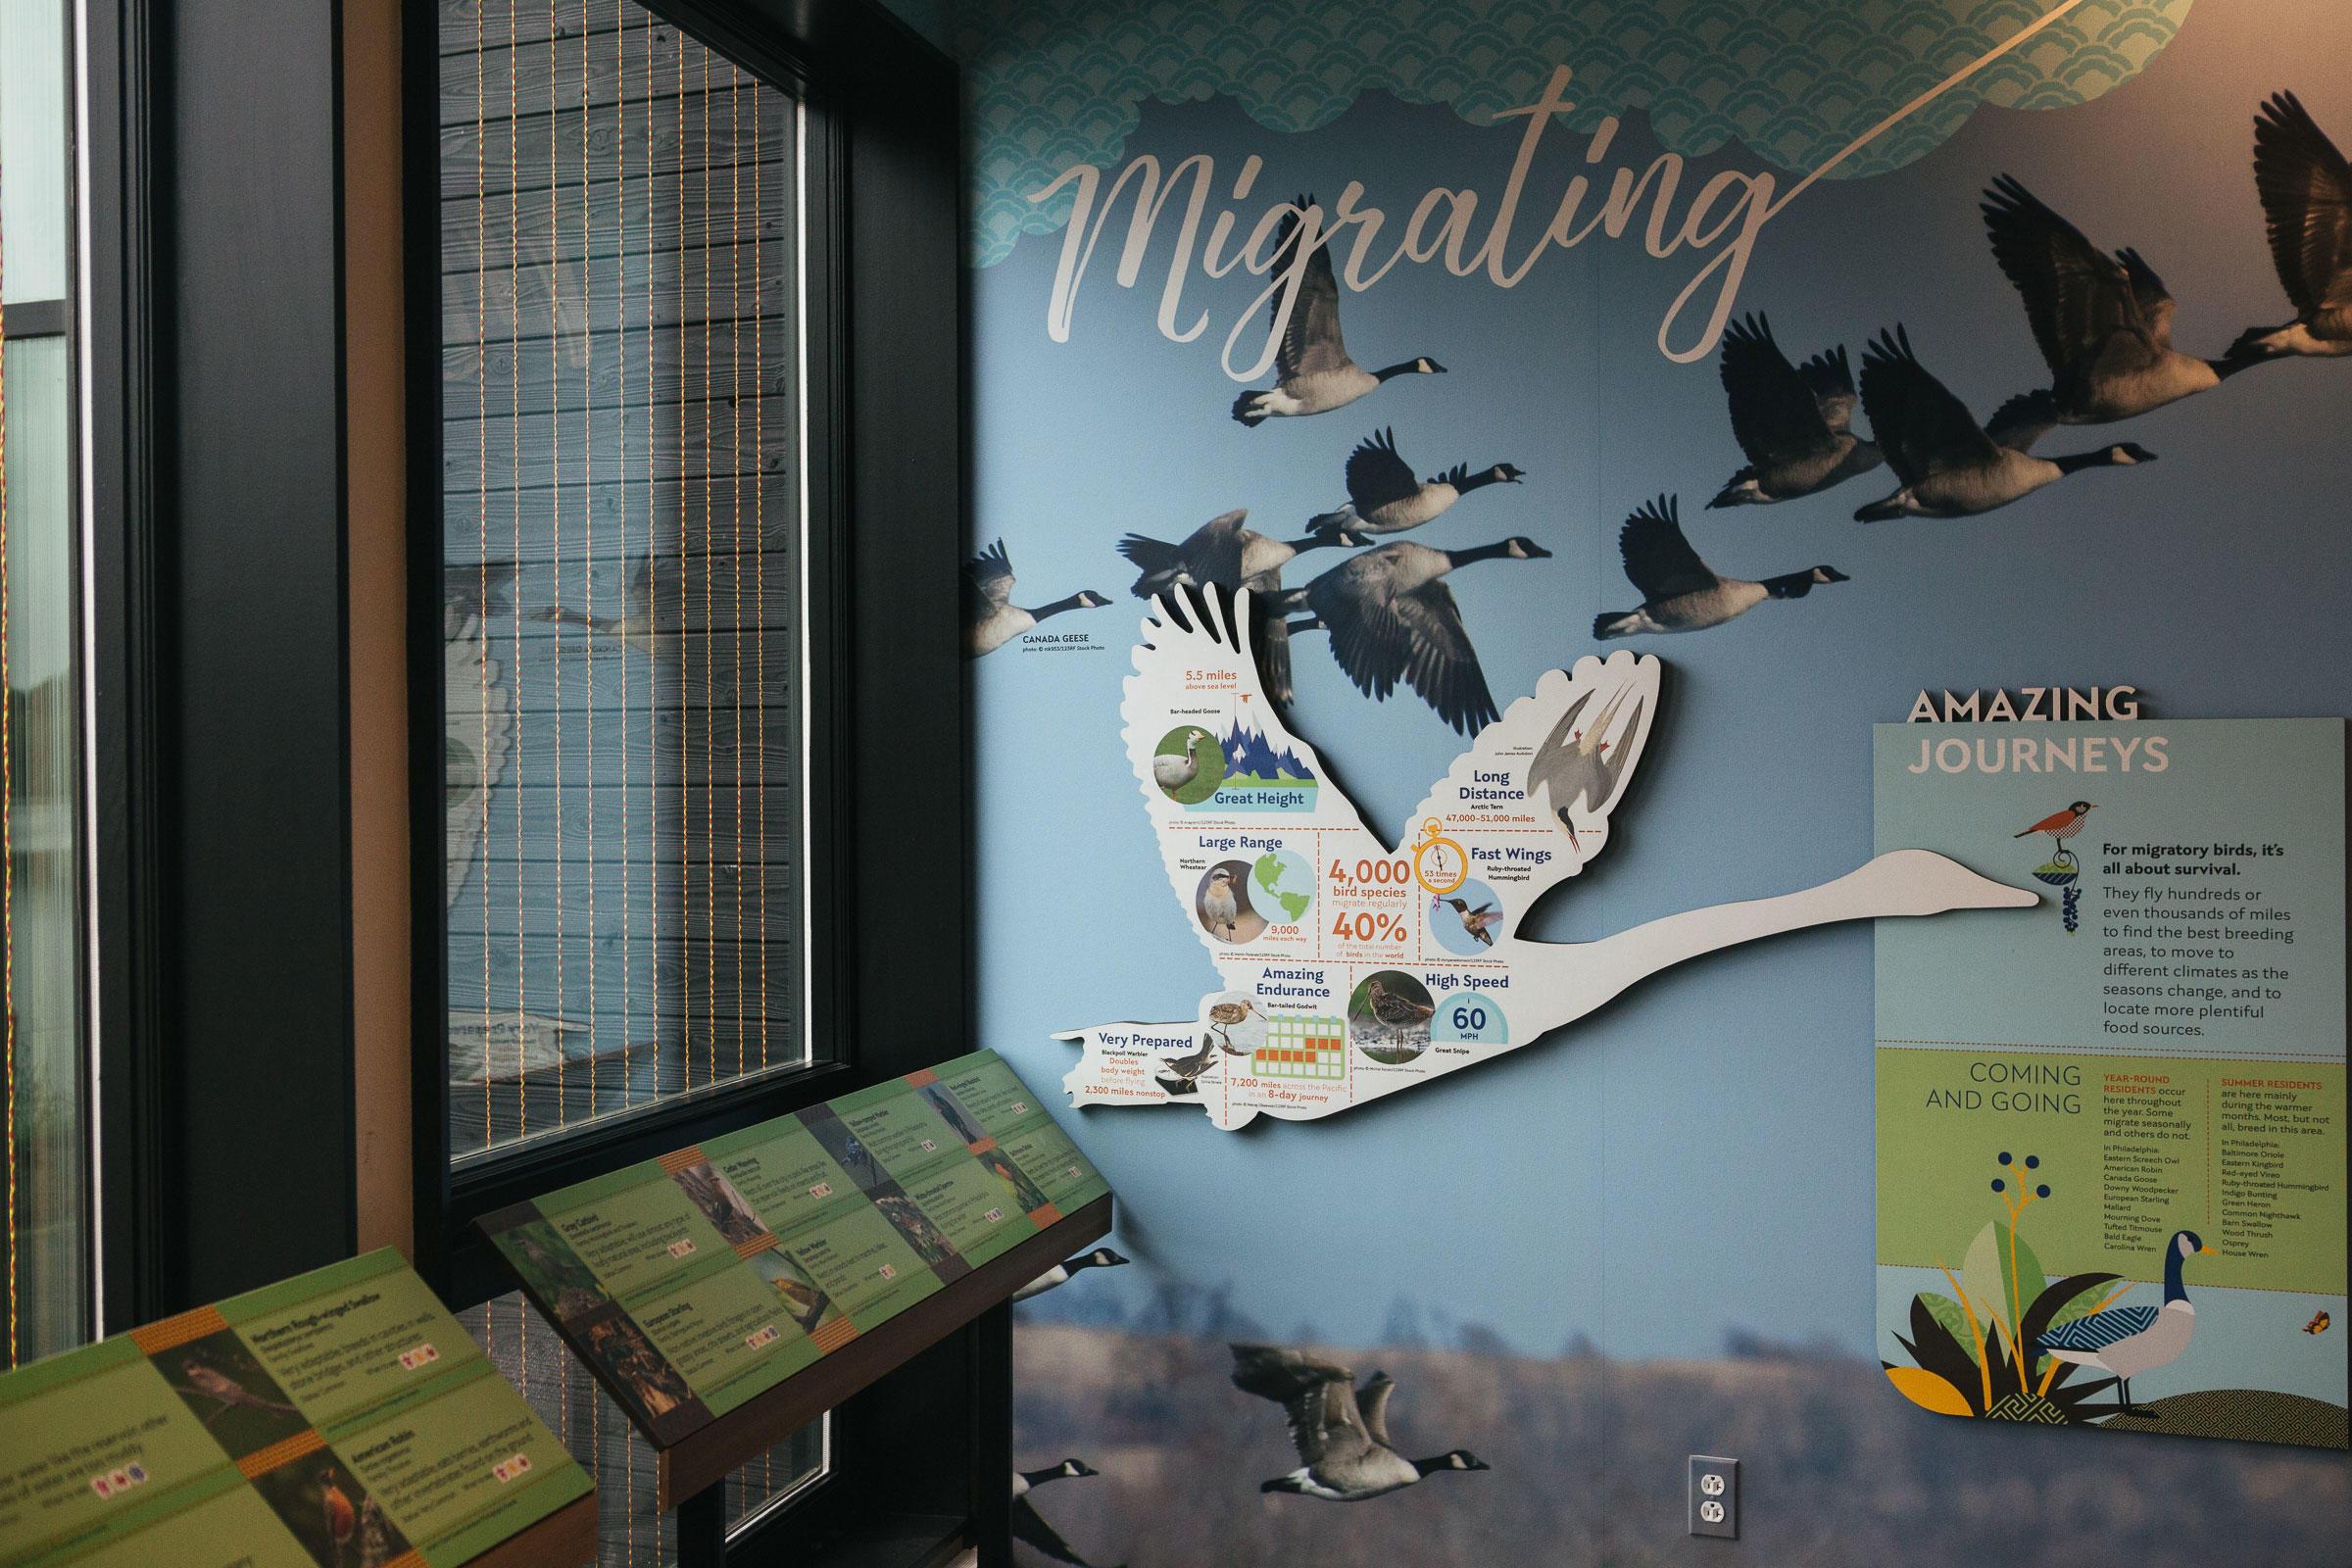 Strawberry Mansion Reservoir bird migration exhibit in The Discovery Center. Michelle Gustafson